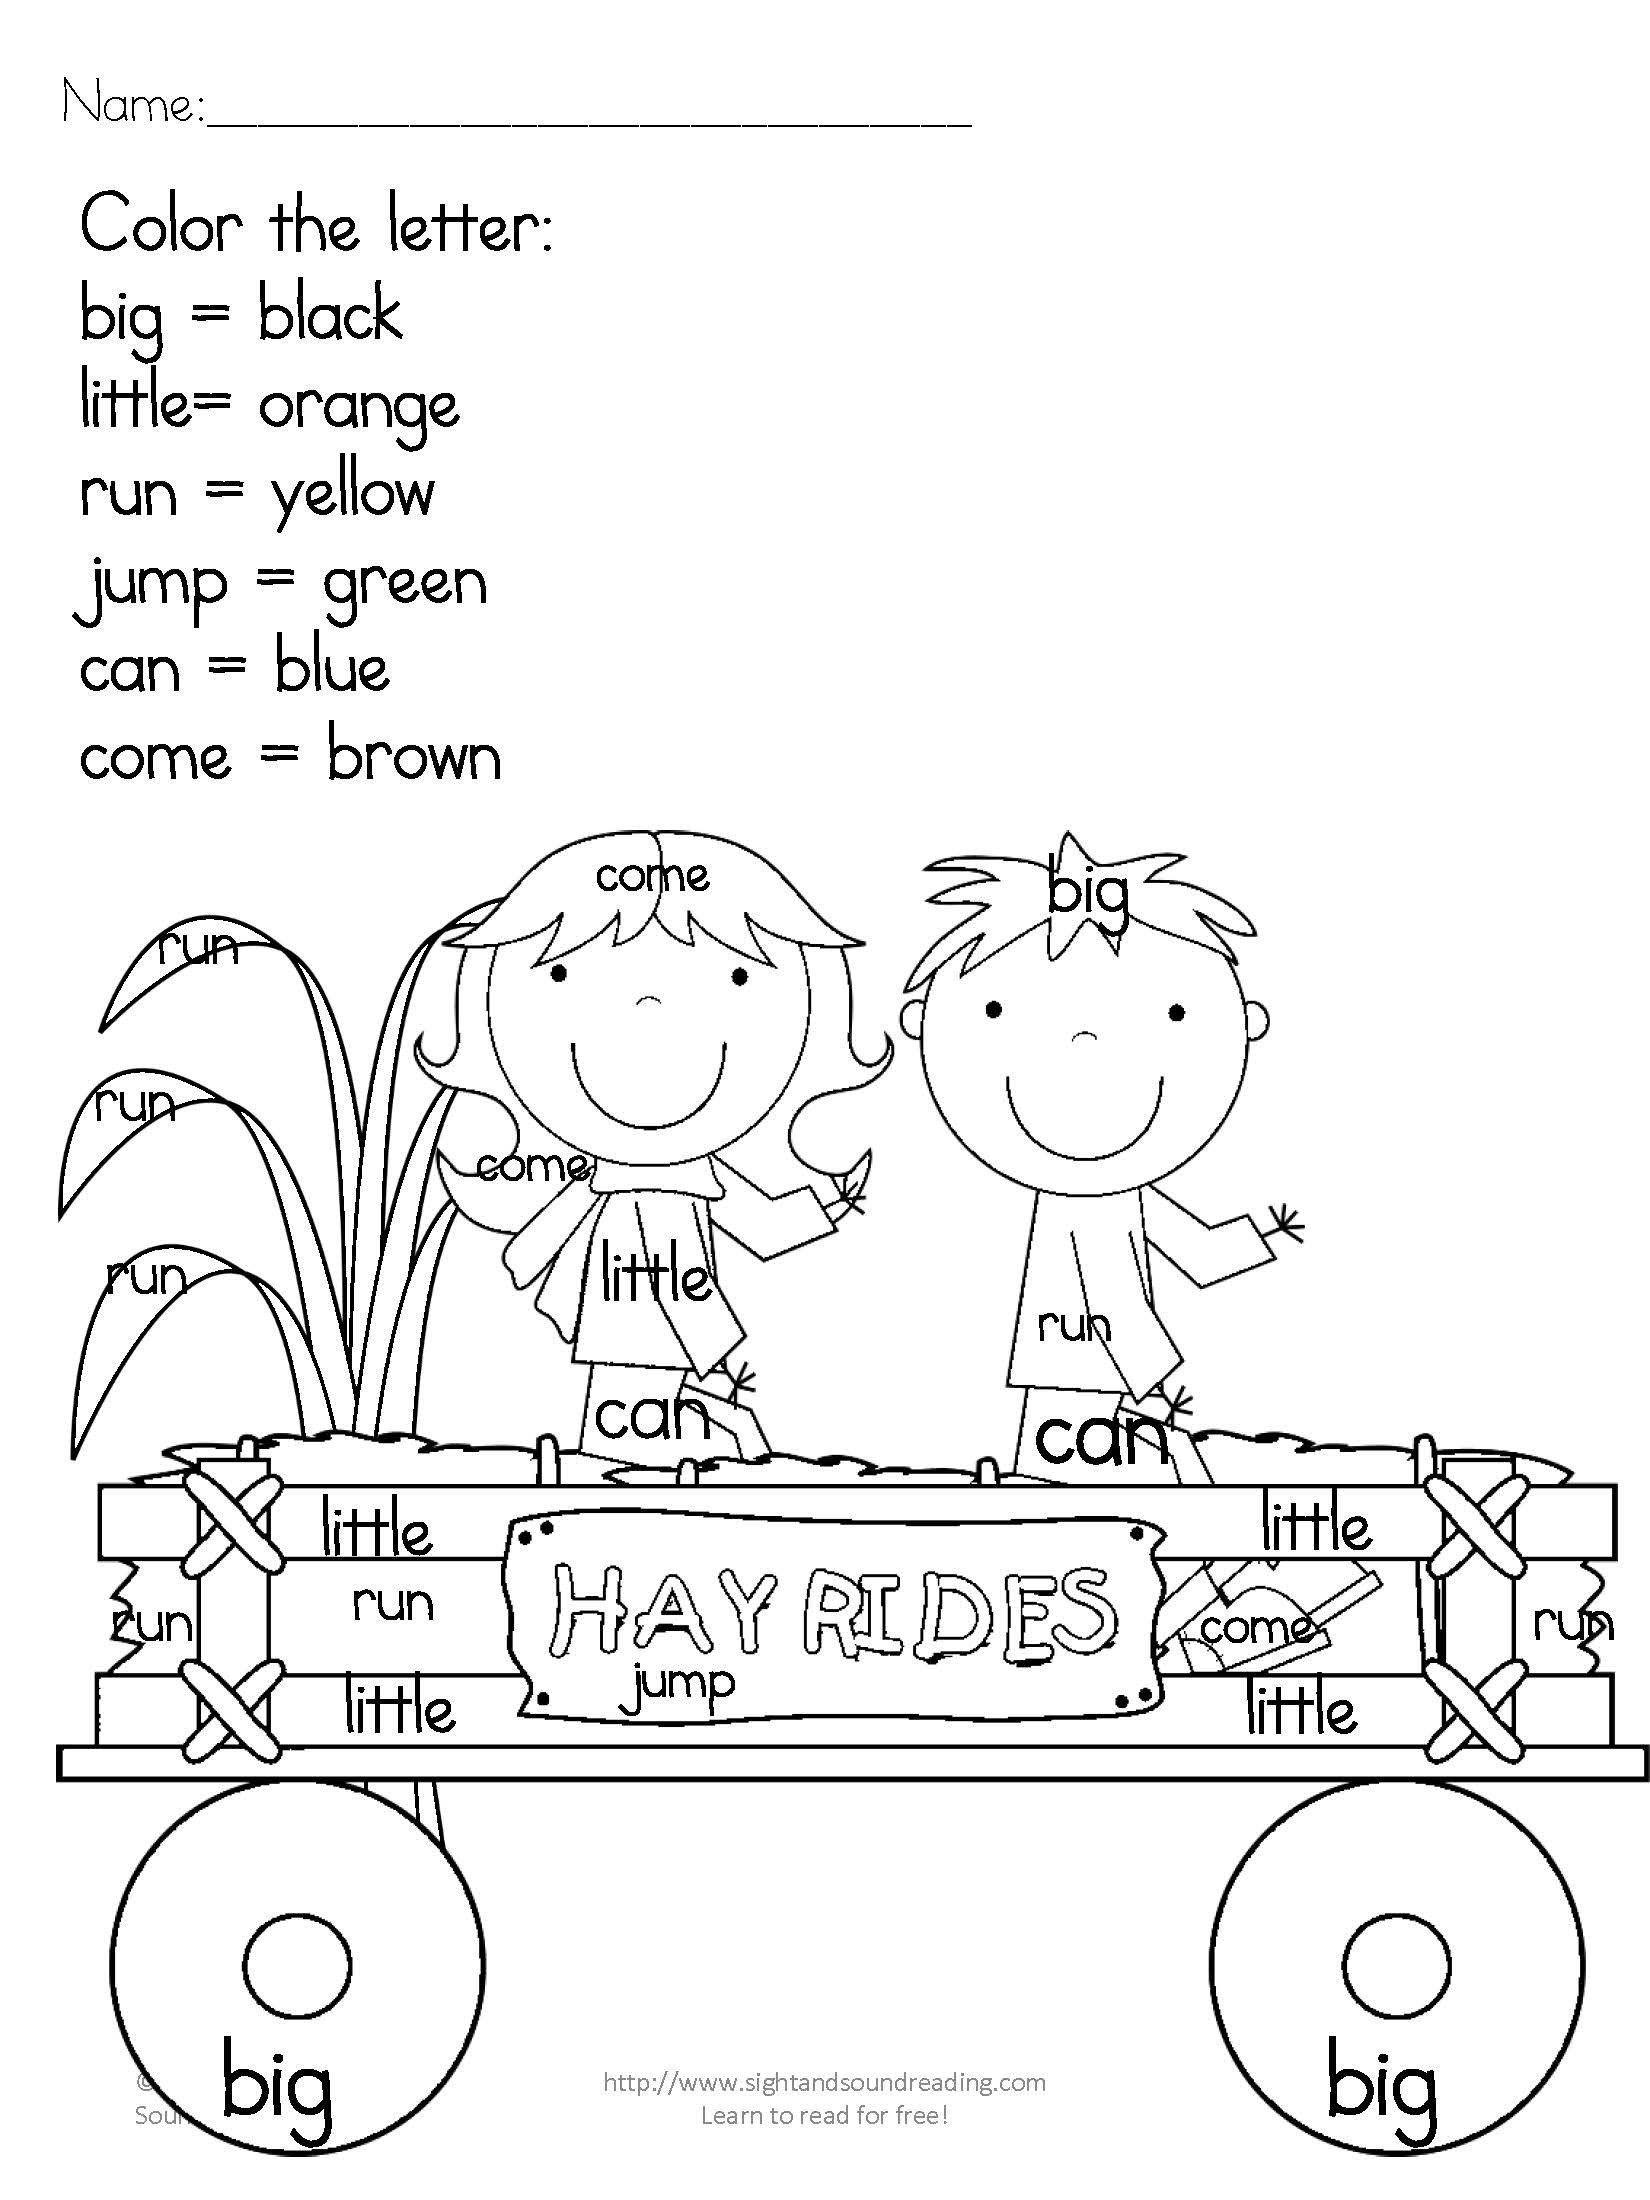 Hurricane Worksheets For Kids Kindergarten Worksheets Free And Printable Math Worksheets In 2020 Sight Words Kindergarten Sight Word Coloring Sight Words